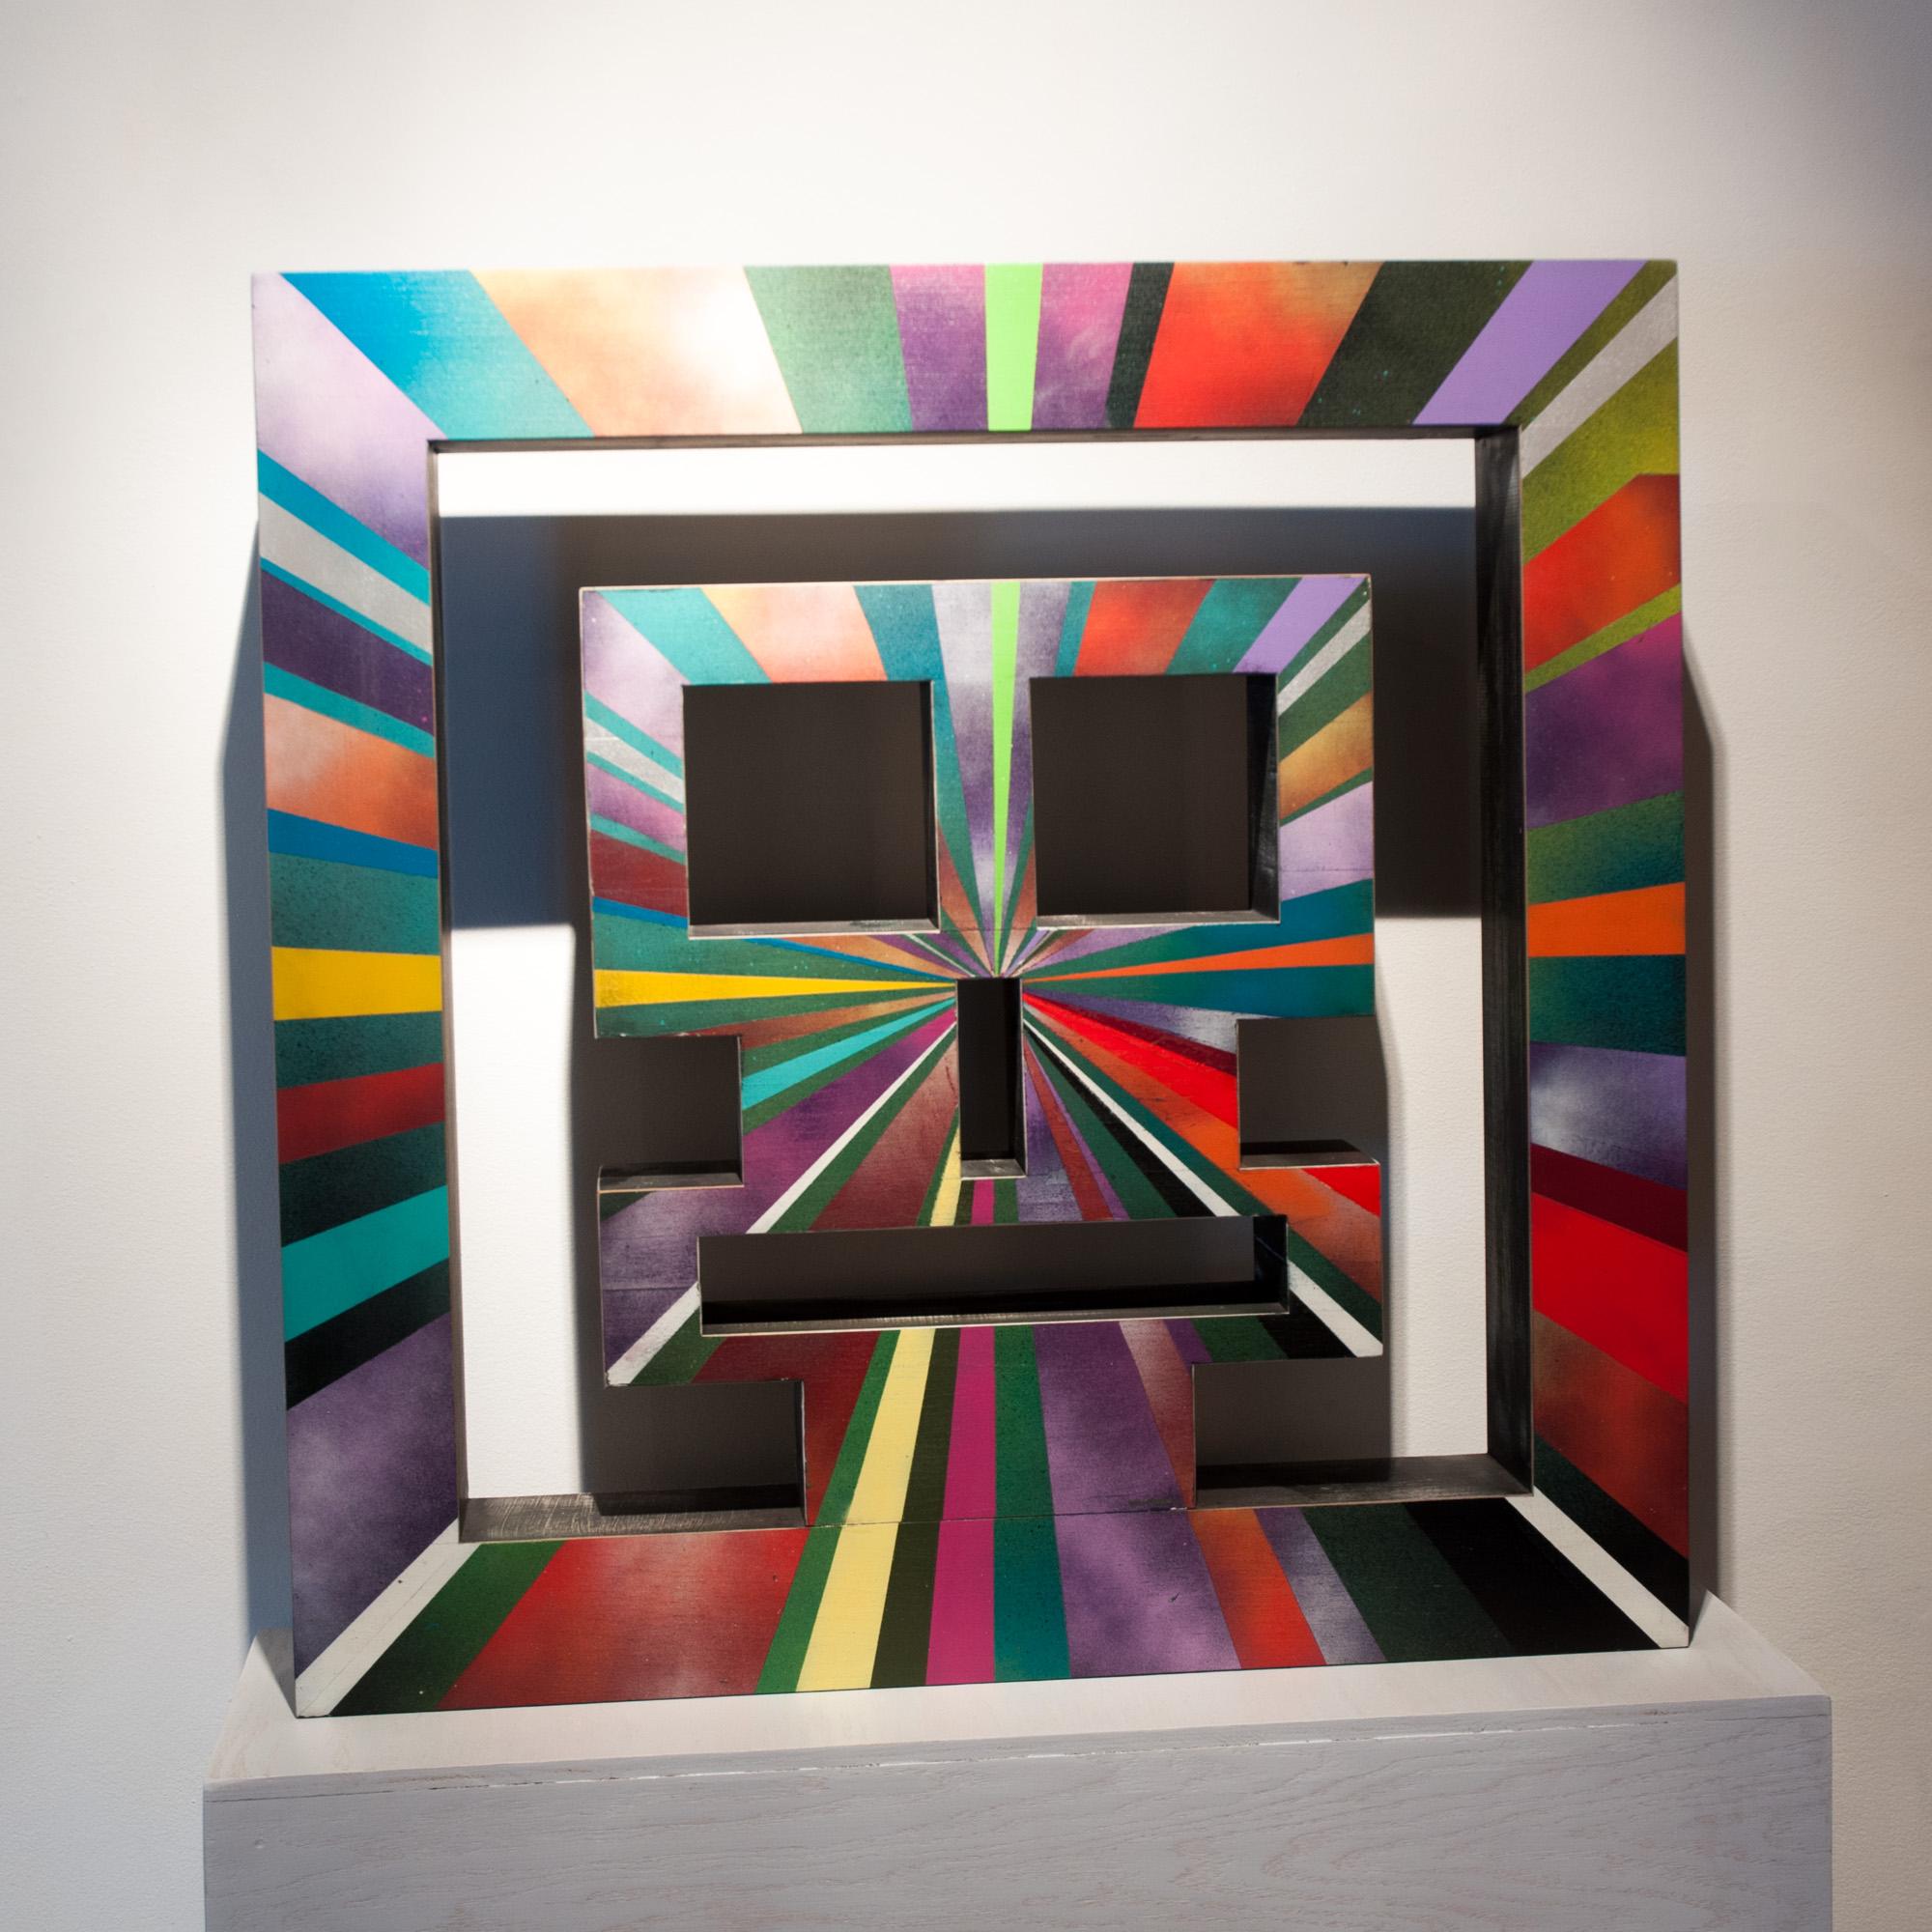 Evereman Big Bang Evereman (collab w/Peter Ferrari) poplar & paint 32 x 32 x 6 inches JWI 002G